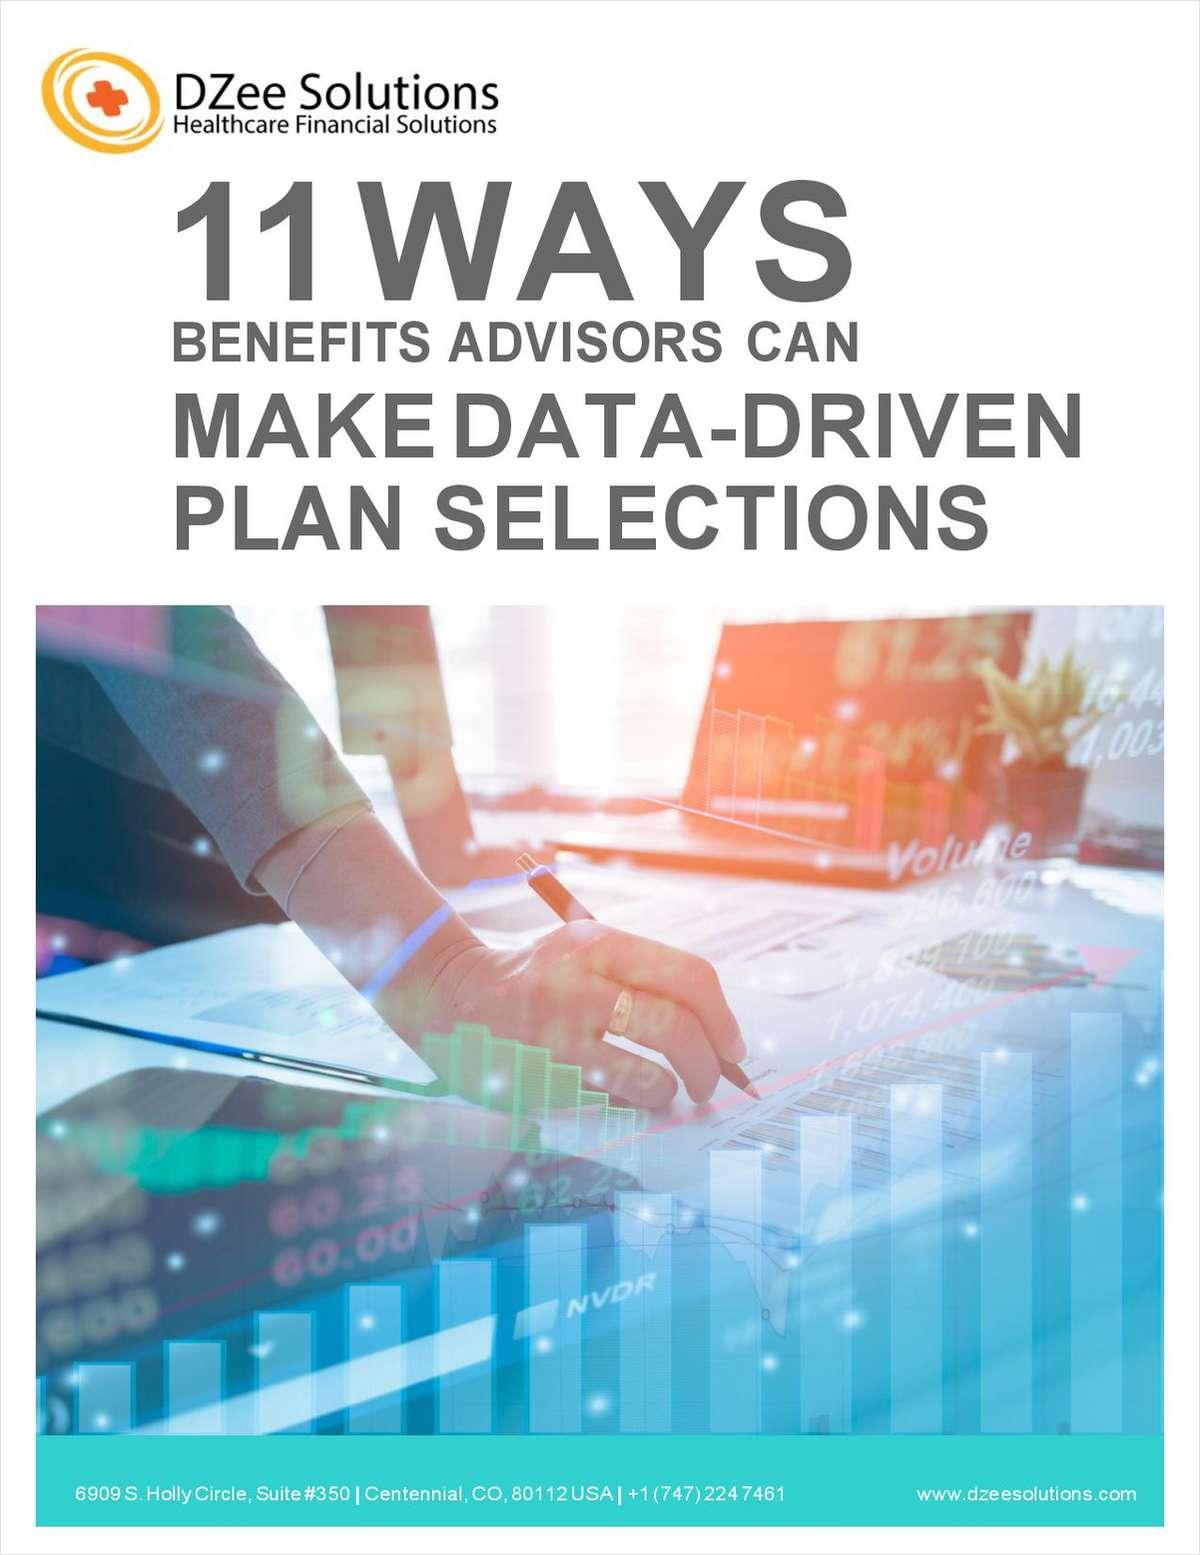 11 Ways Benefits Advisors Can Make Data-Driven Plan Selections